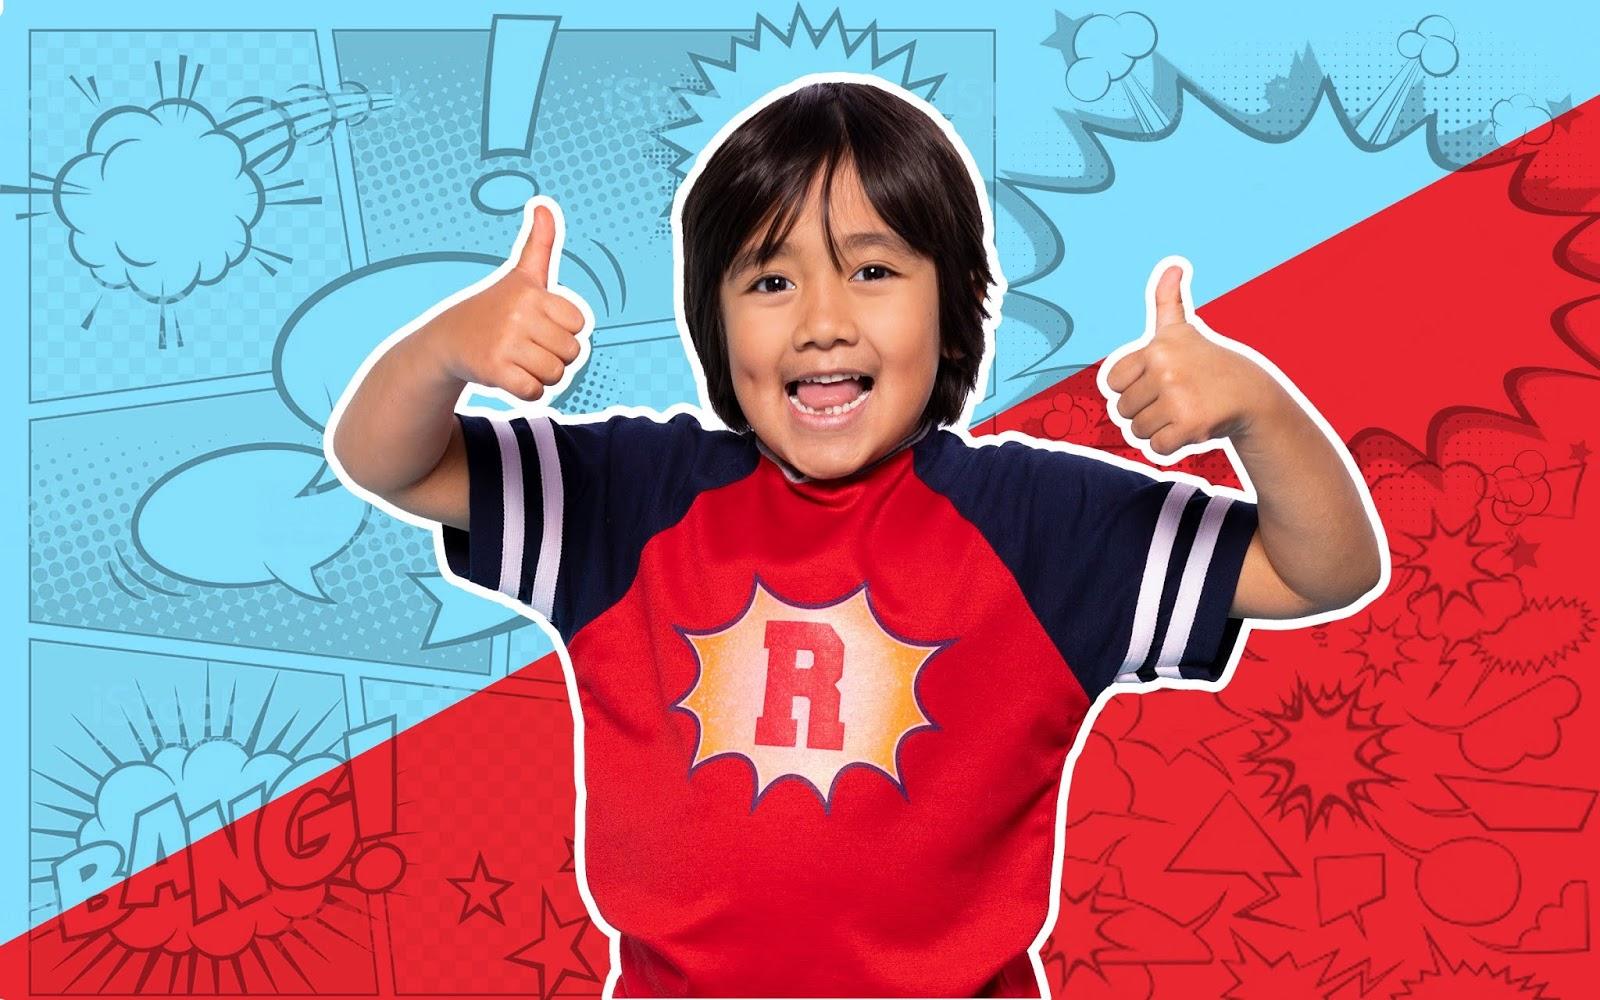 8-year-old Ryan Kaji is highest paid YouTuber in 2019